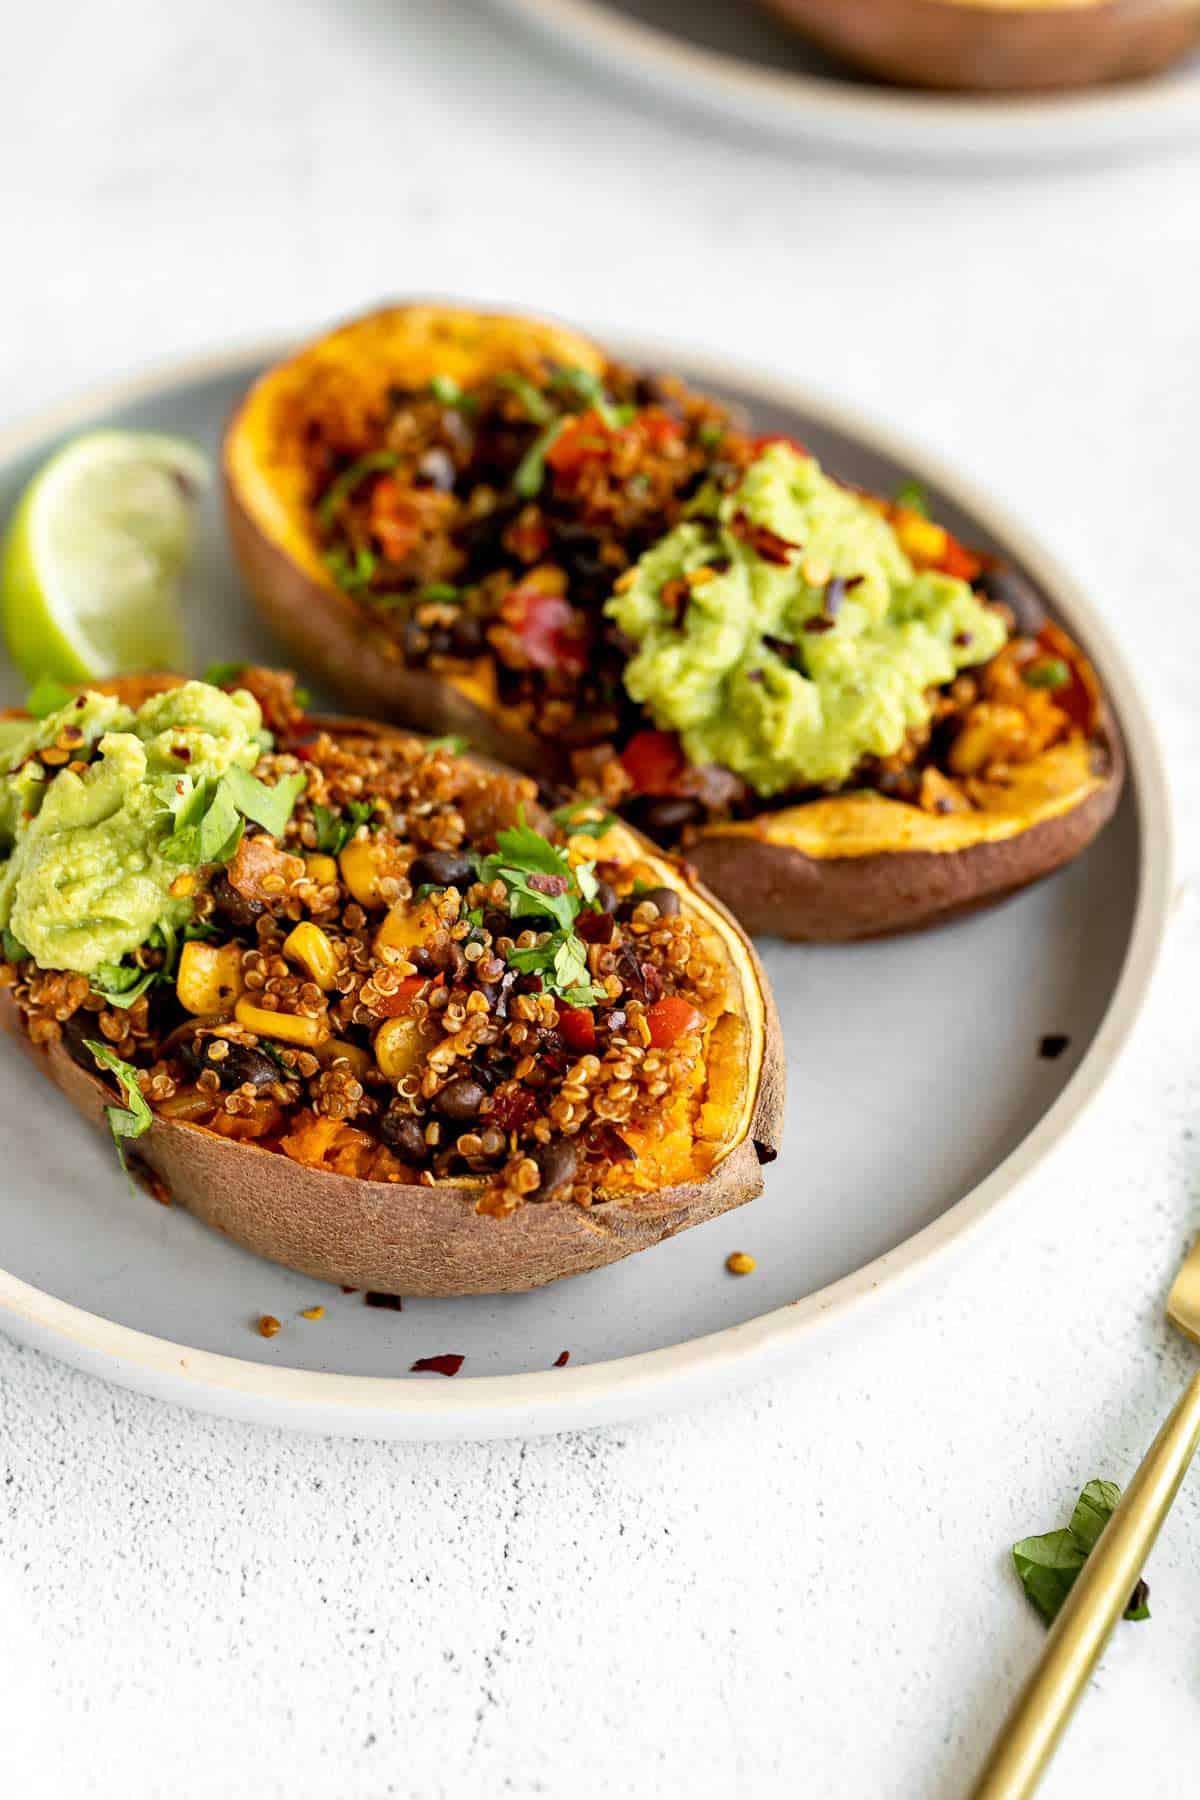 vegan mexican quinoa stuffed sweet potatoes with guacamole